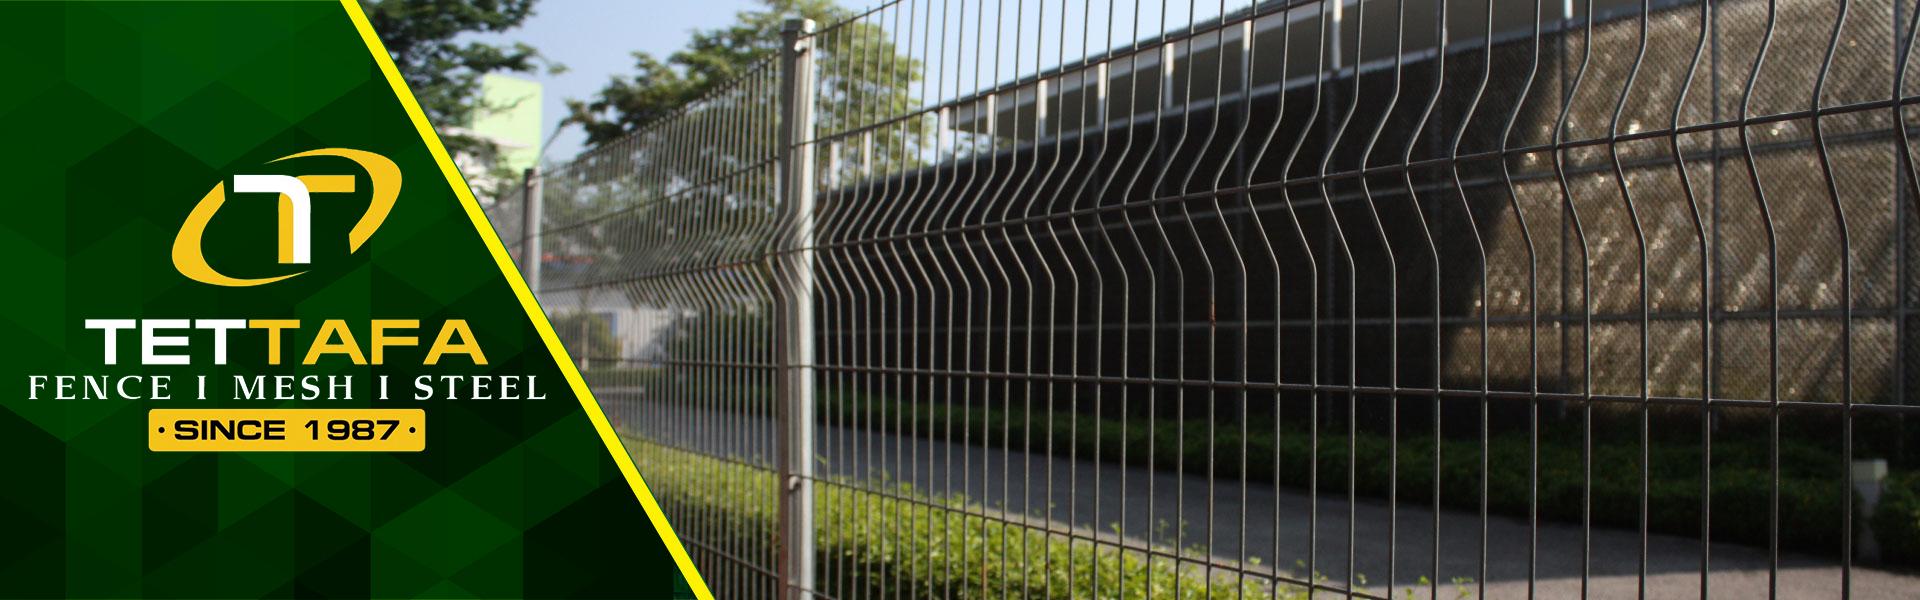 High Security Anti Climb Fence Manufacturer in Malaysia | TET Tafa